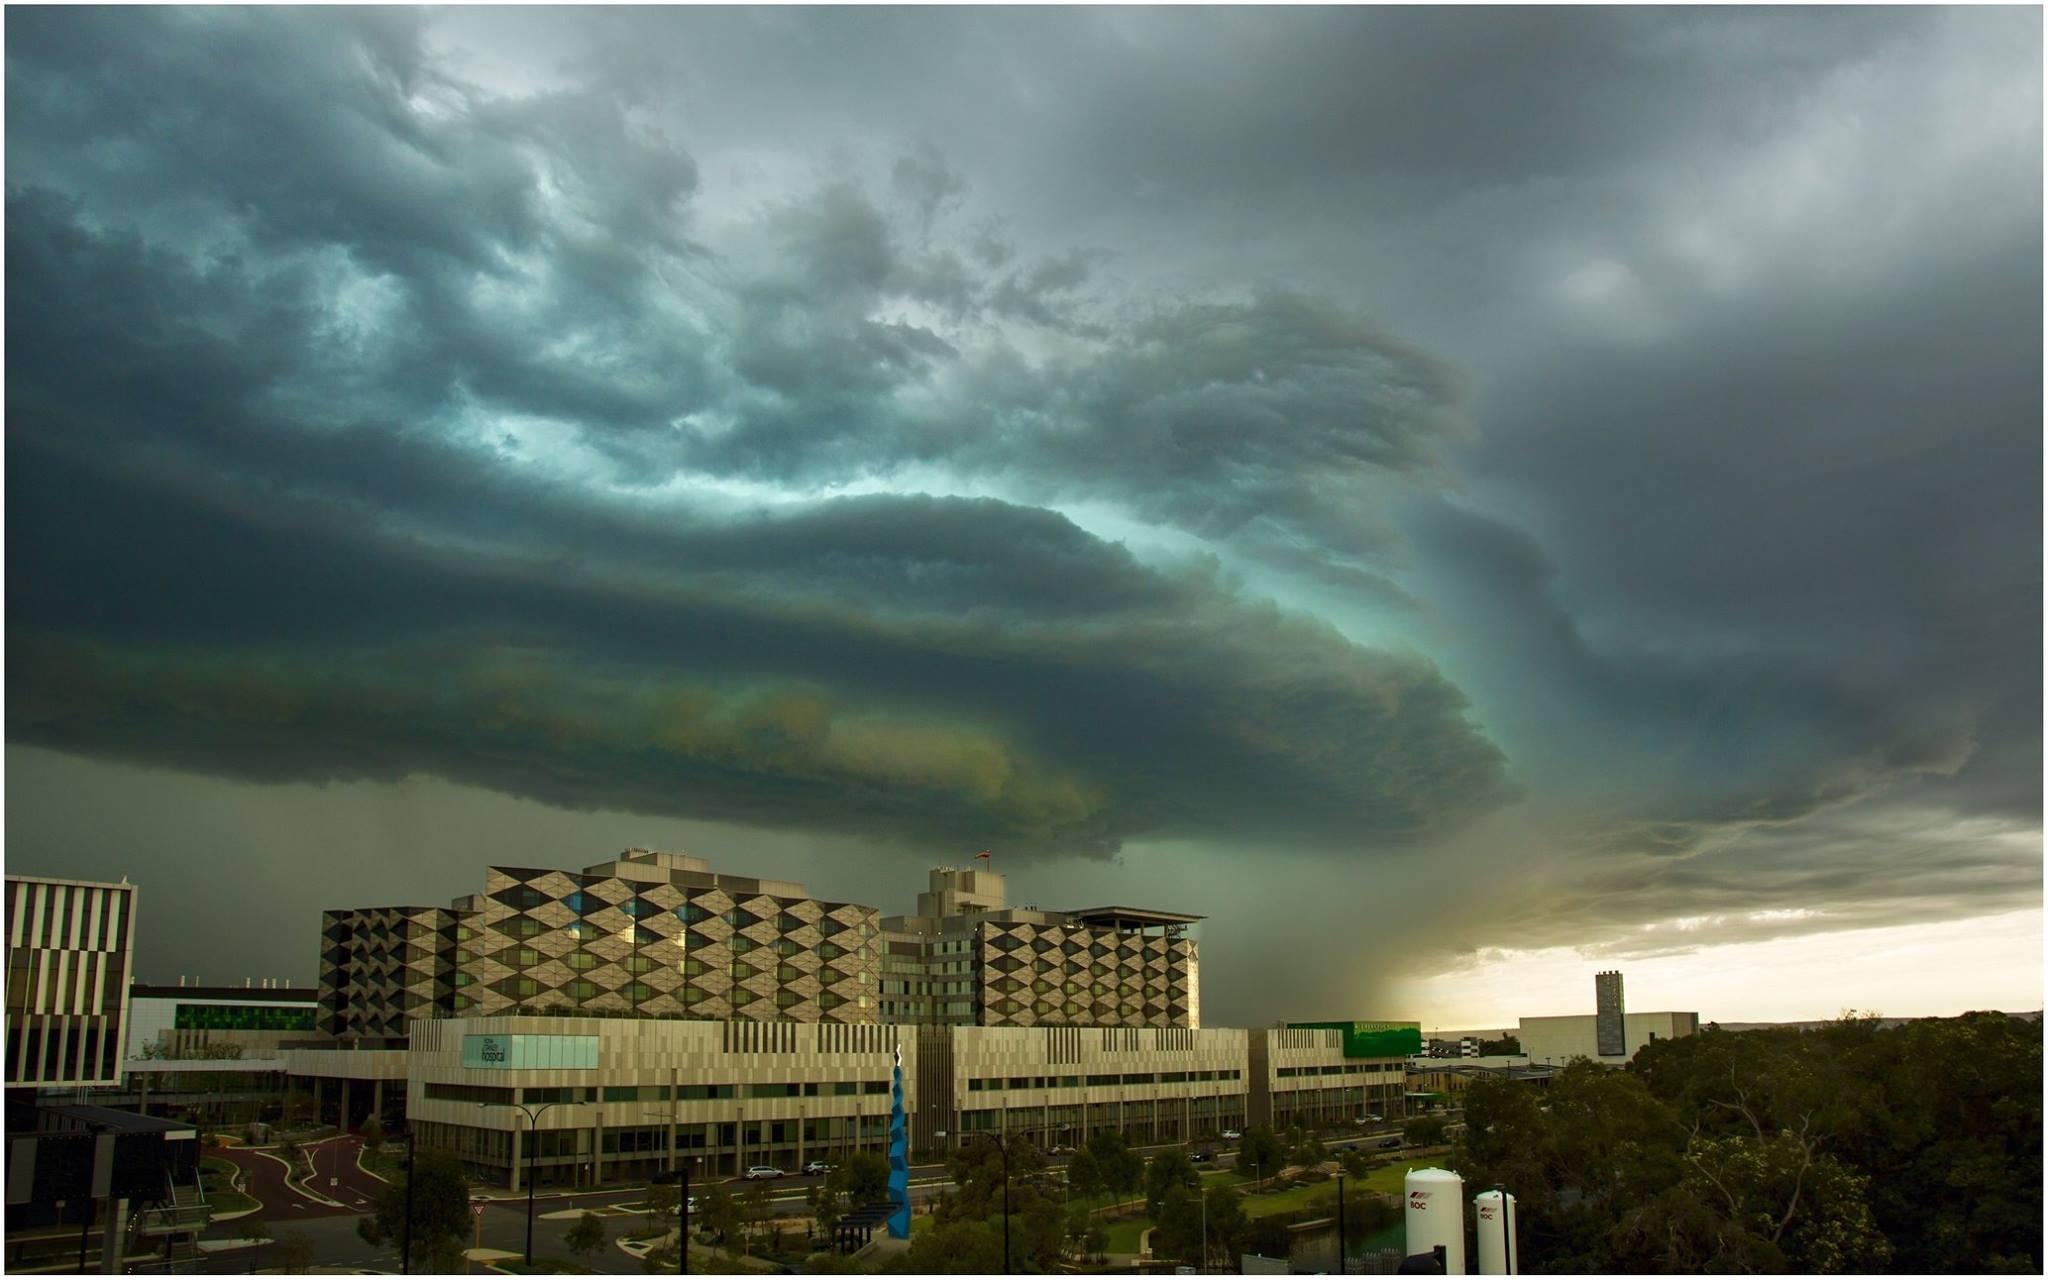 Image: Green-tinged storm cloud over Perth, February 2015. Credit: Ben Clark, cloudtogroundimages.com